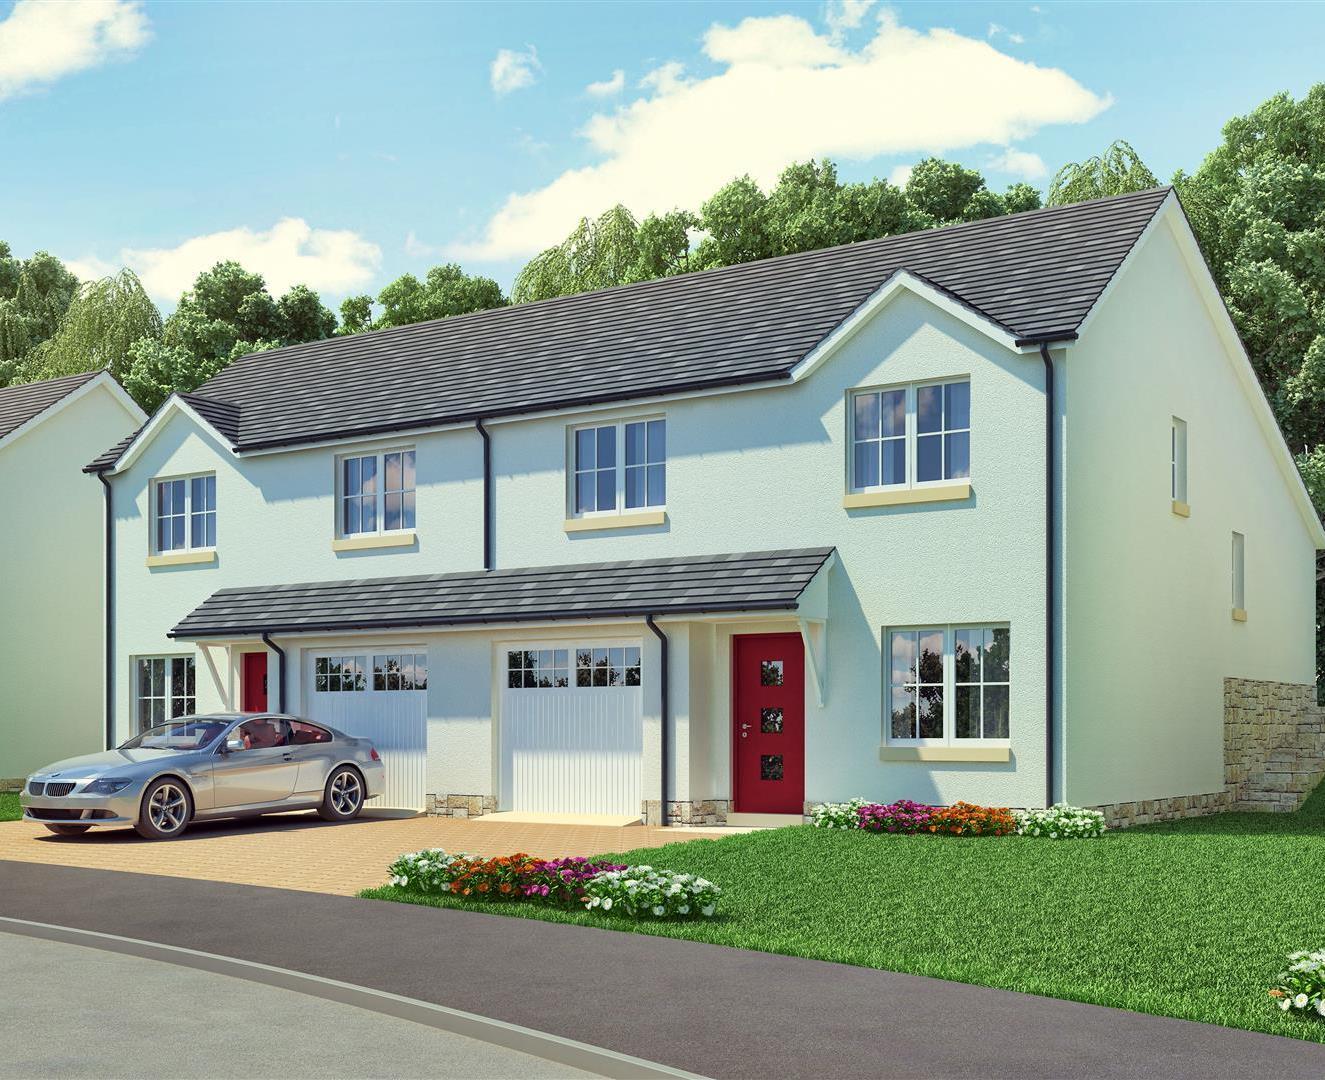 GS Brown Construction, The Callum, Hayfield Brae, Methven, Perthshire, PH1 3PL, UK